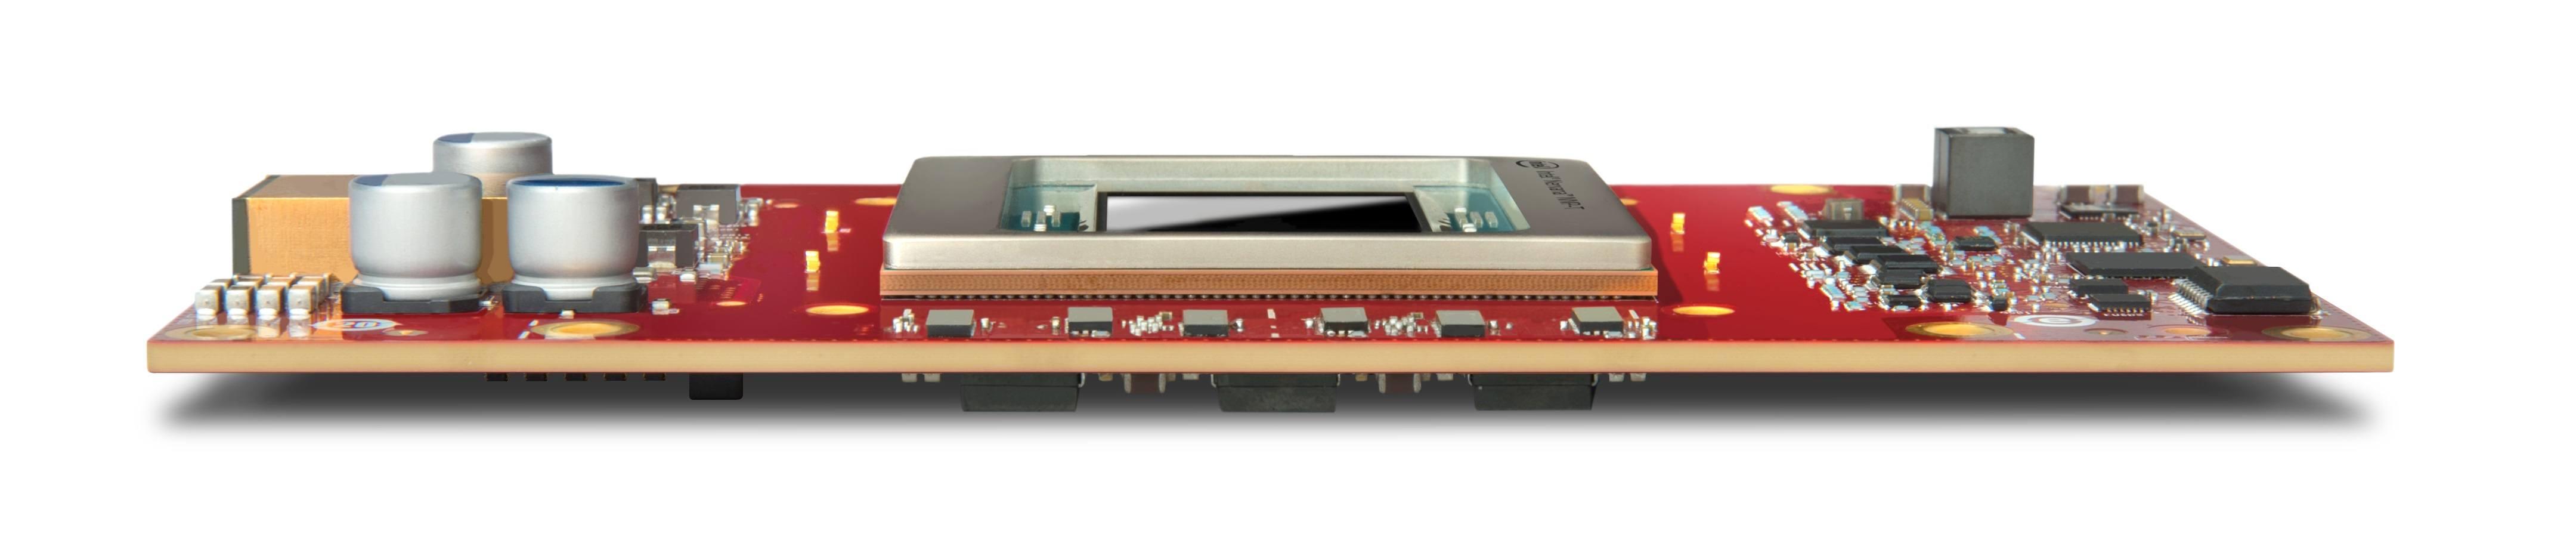 Intel-NNP-T-Mezzanine-card-2